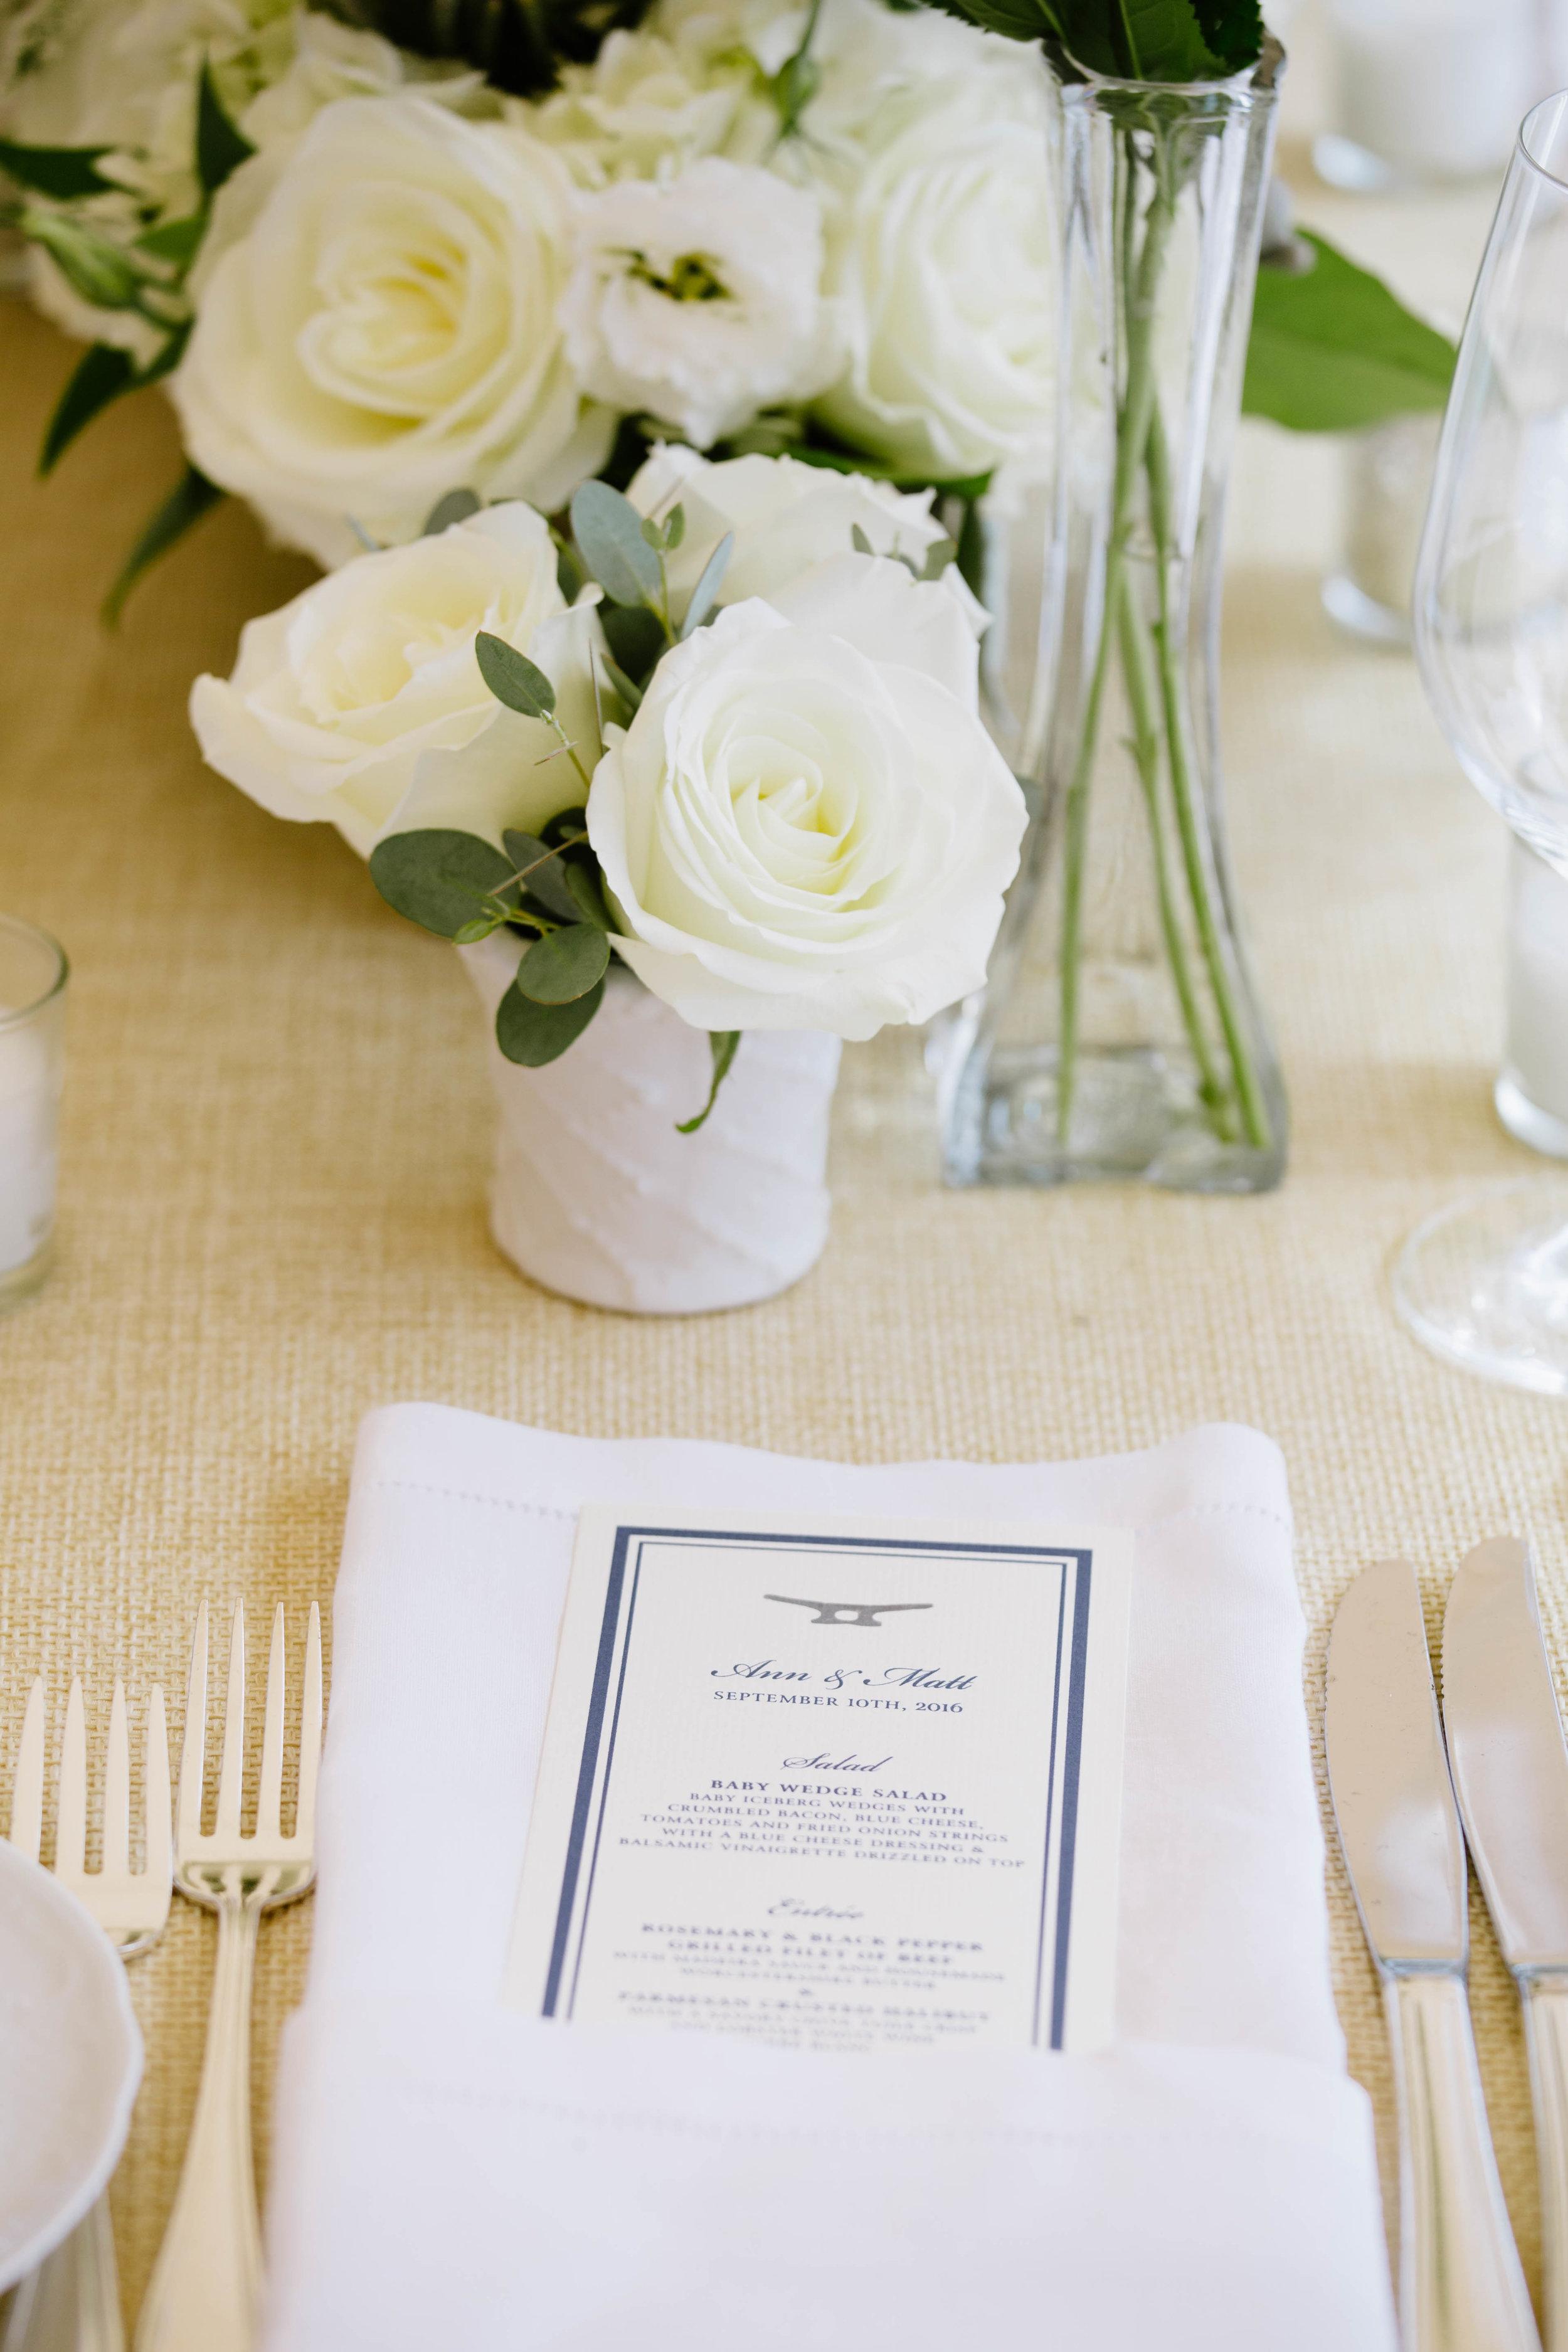 Candid-Wedding-Photography015.jpg